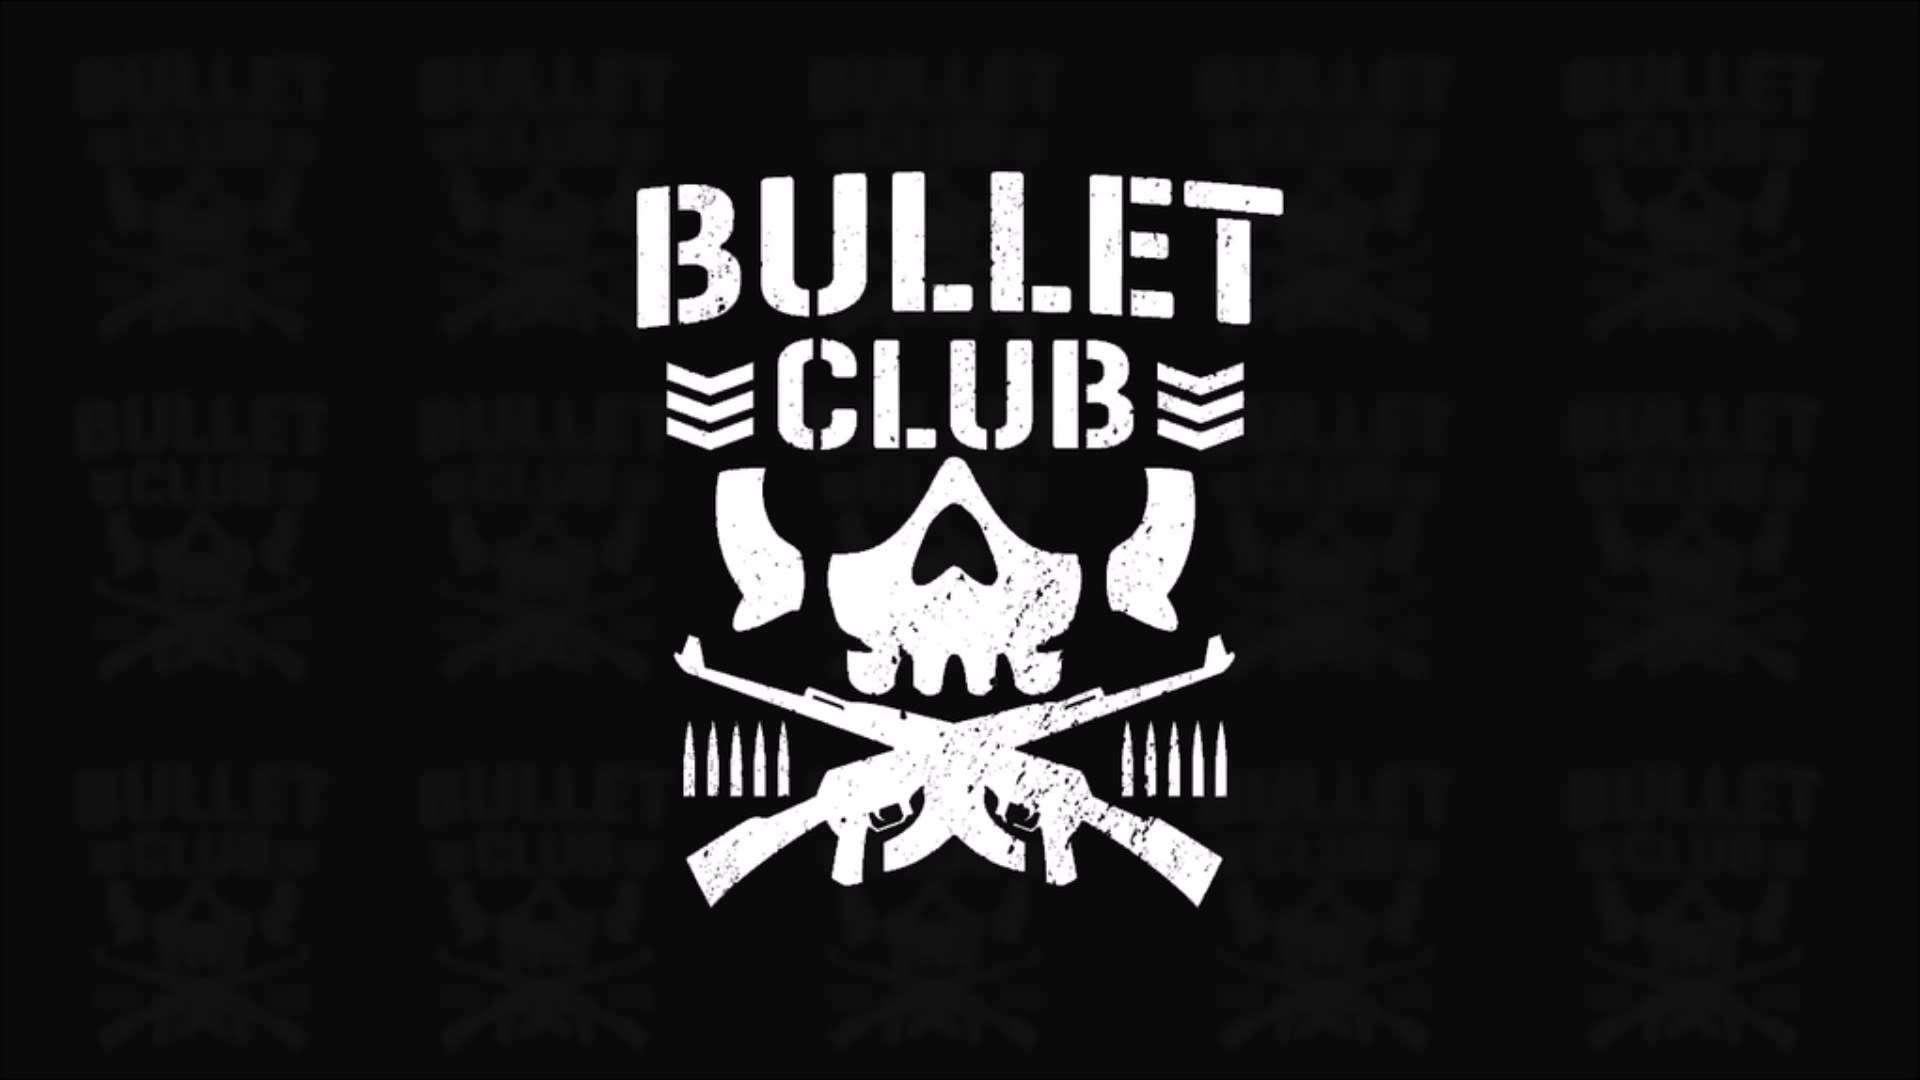 Bullet Club, equipo de New Japan Pro Wrestling creado por Prince Devitt